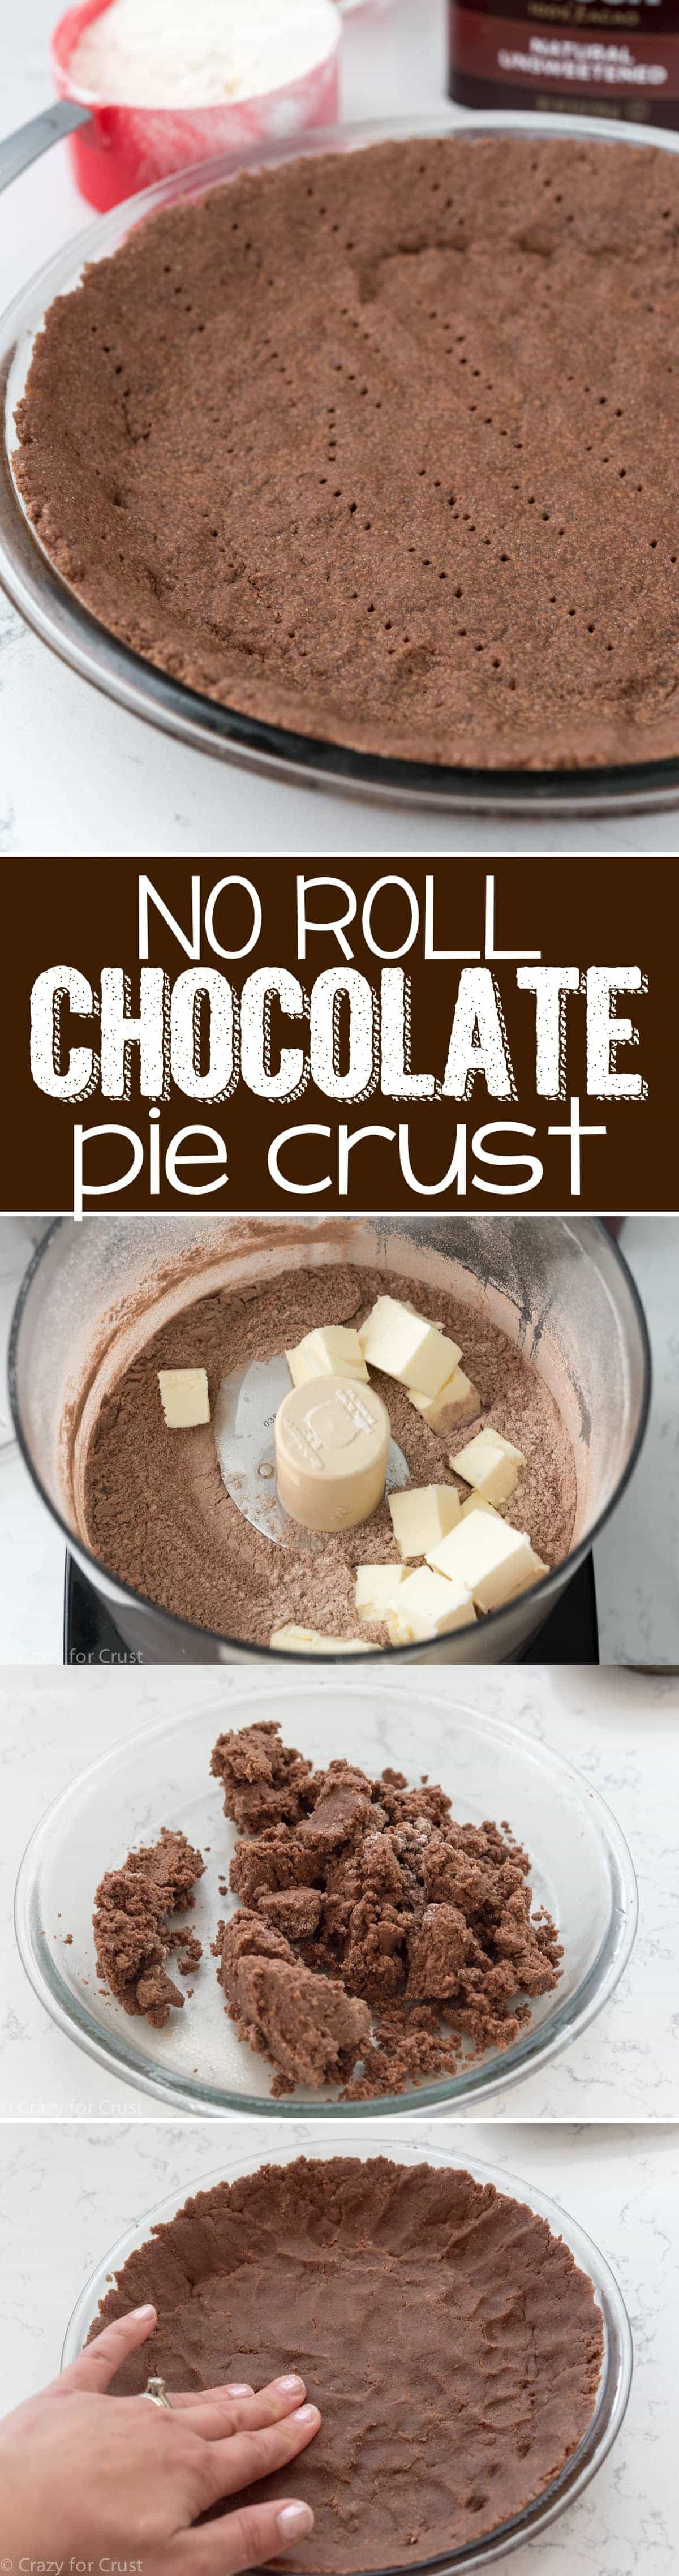 Chocolate Pie Crust  No Roll Chocolate Pie Crust Crazy for Crust